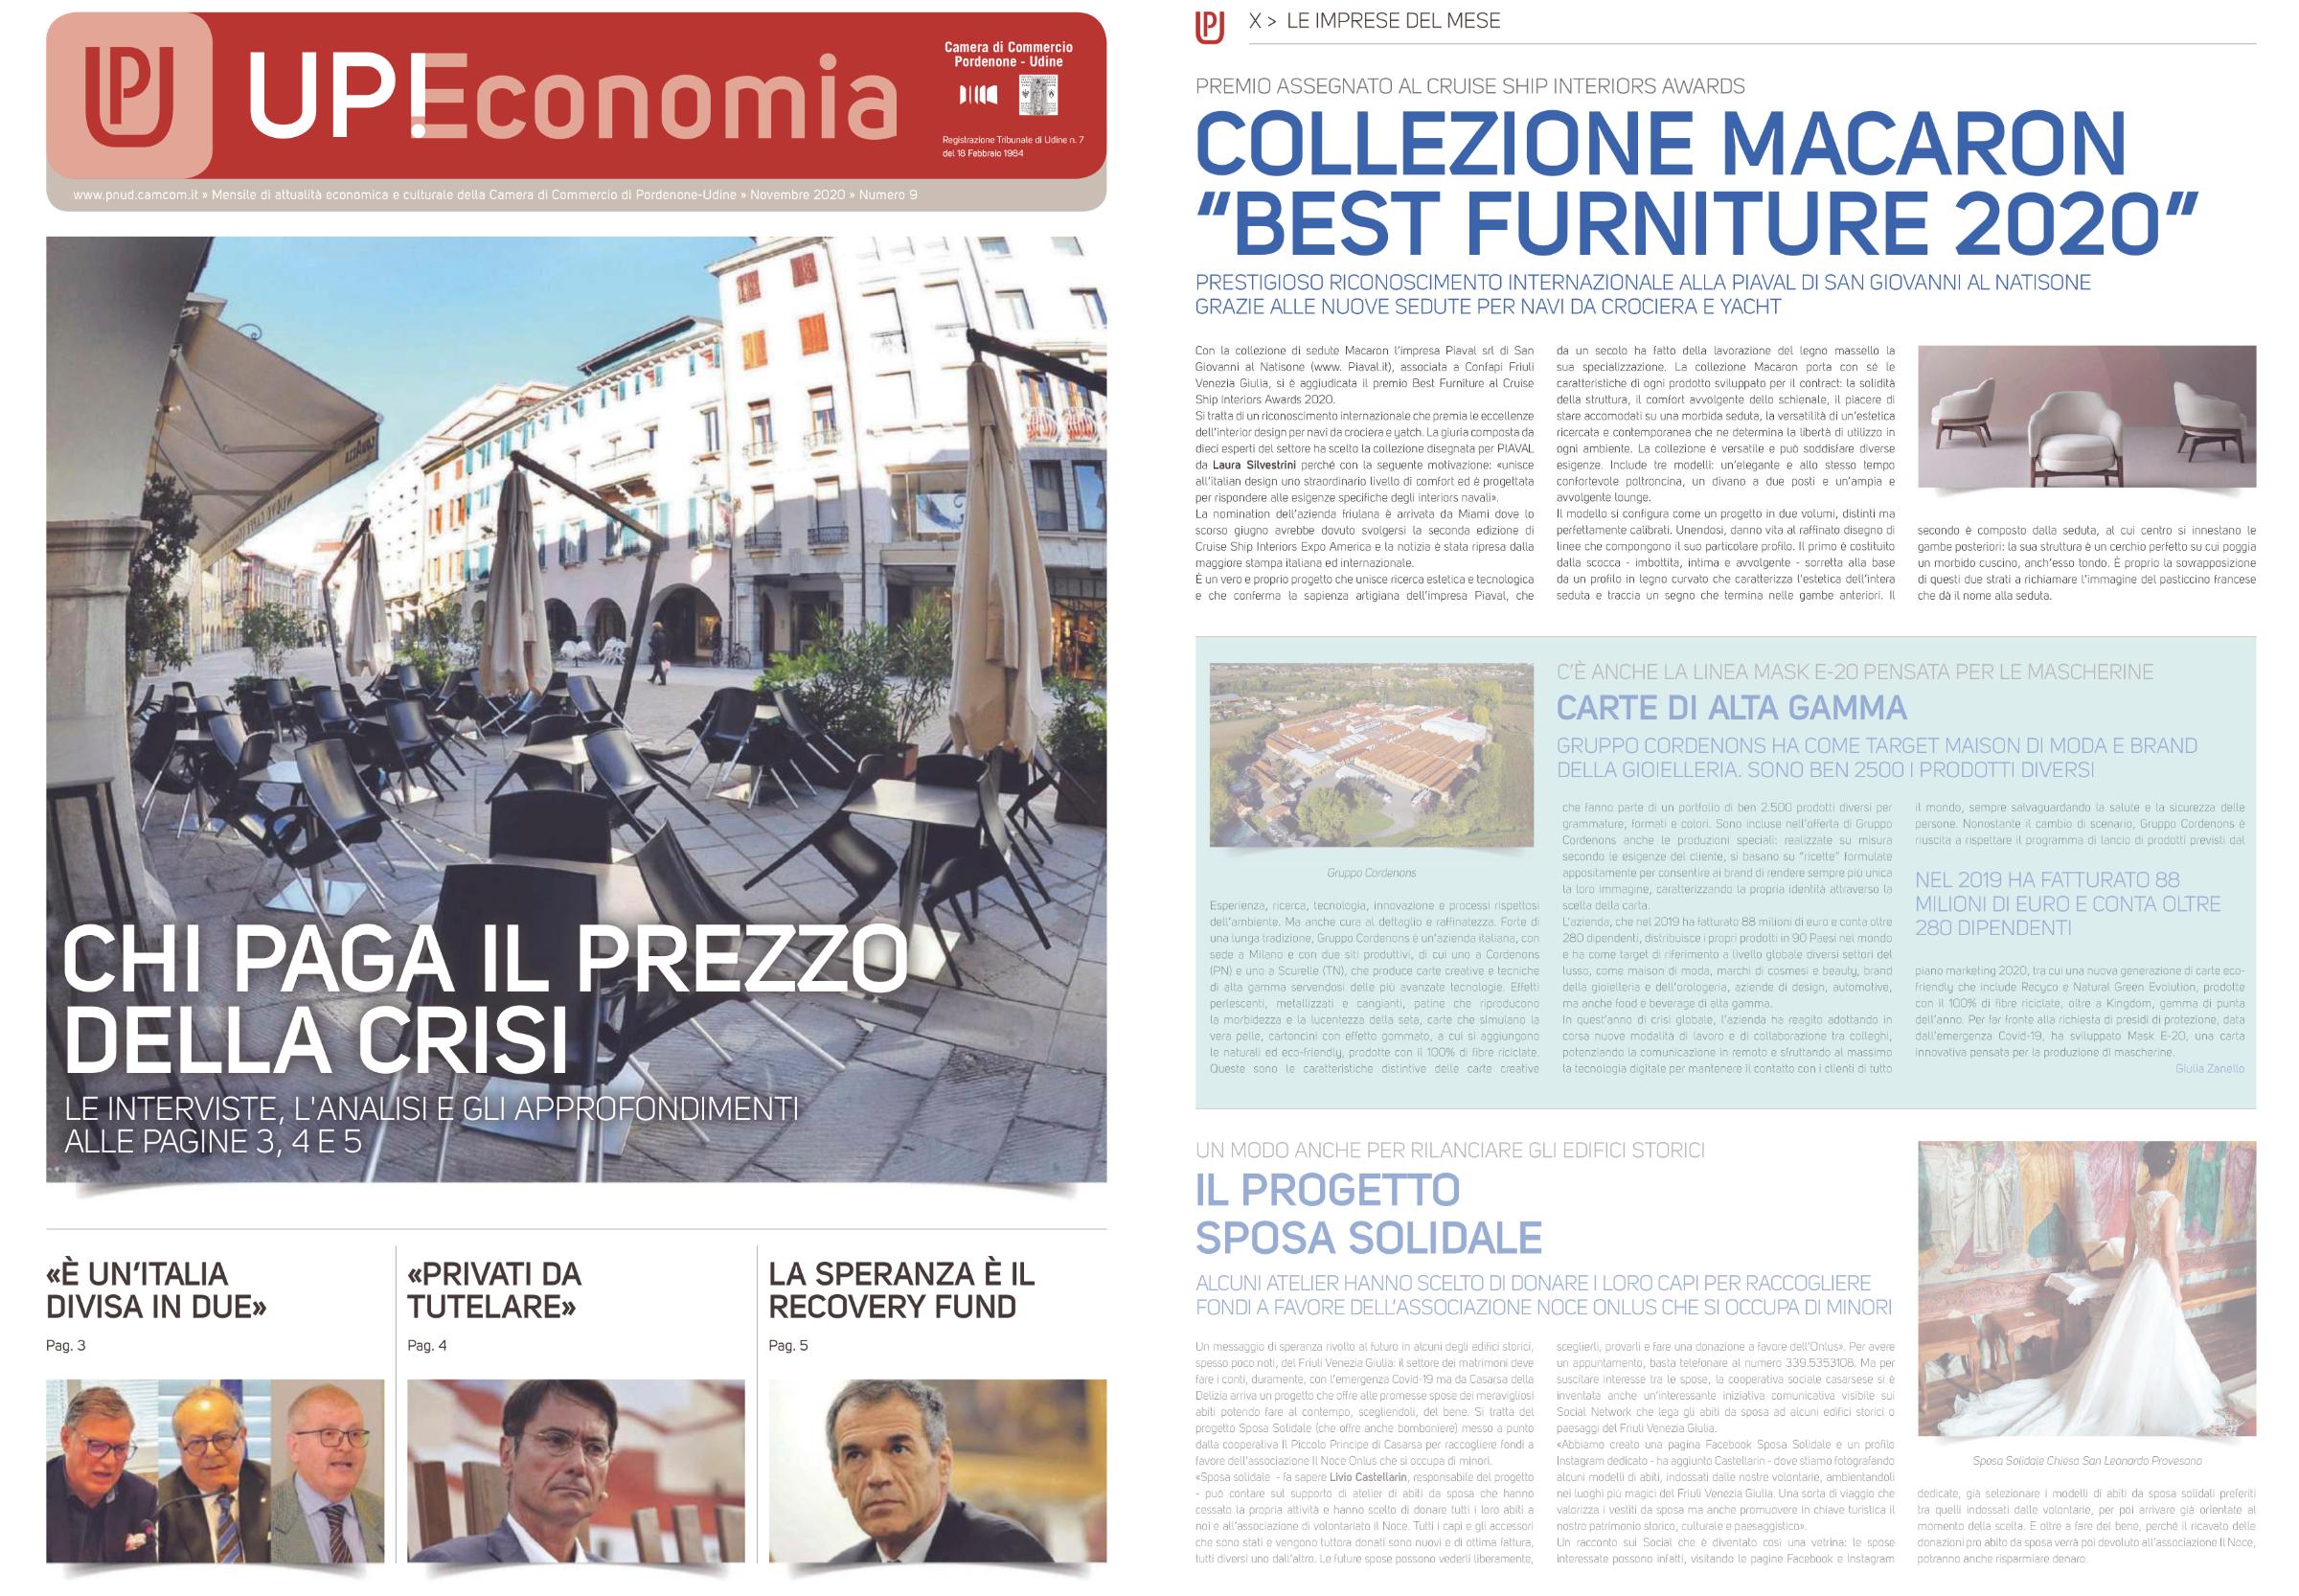 Macaron lounge on Upeconomia magazine